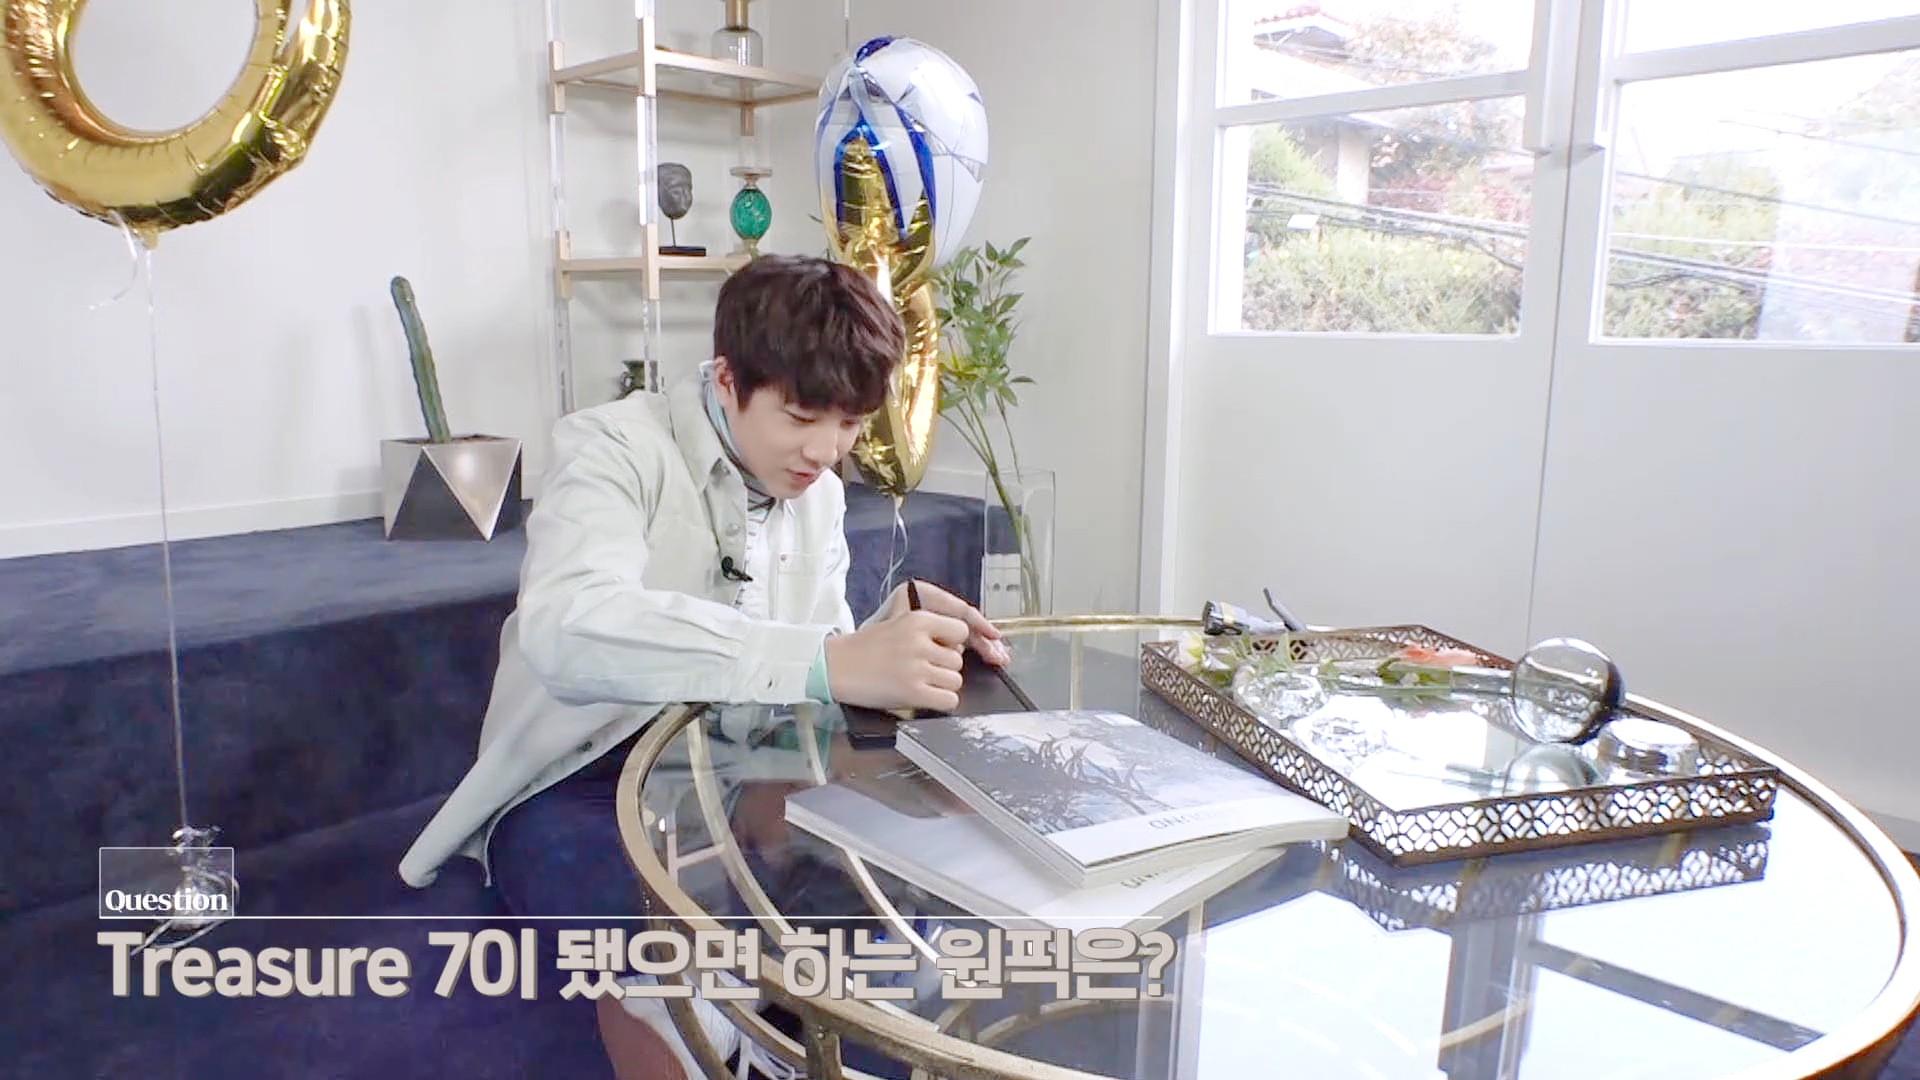 [SURVEY CAM] C#4 소정환 < SO JUNGHWAN>  l YG보석함